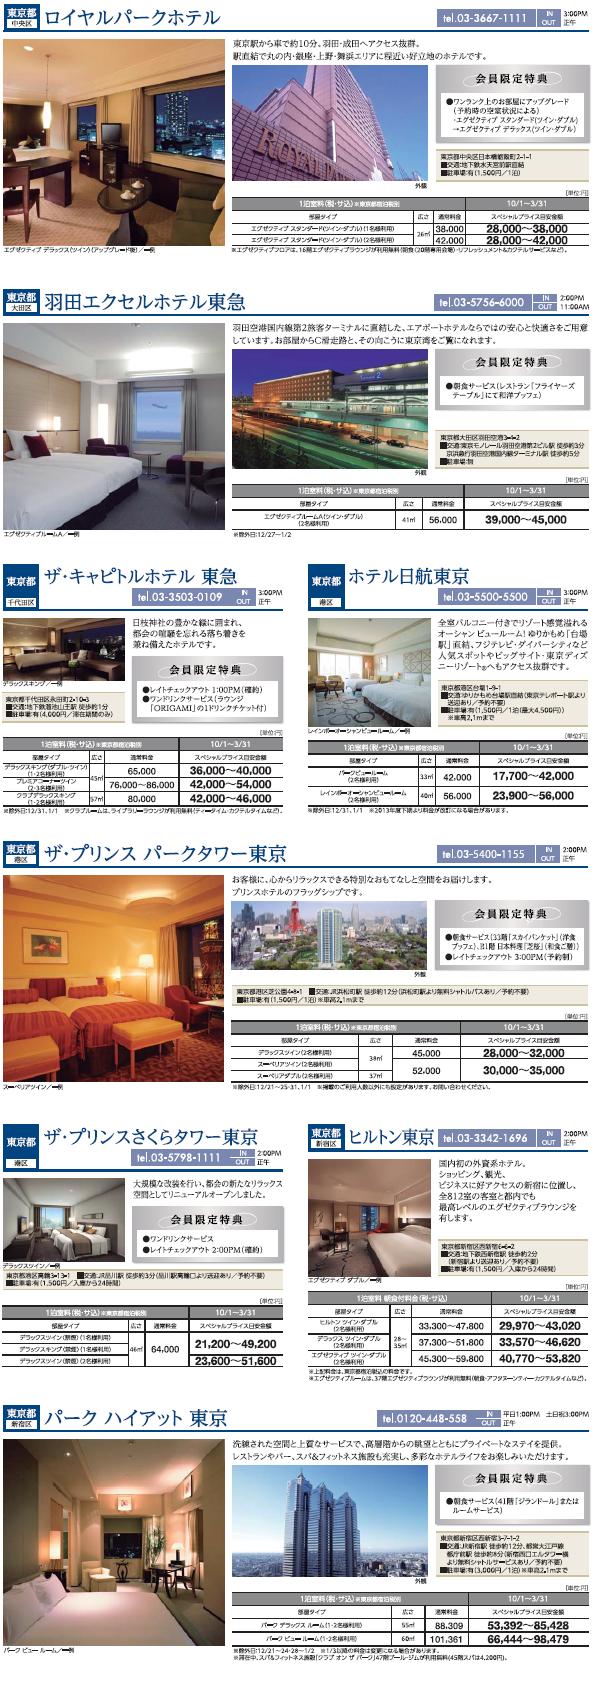 special_price_ plan1309 03